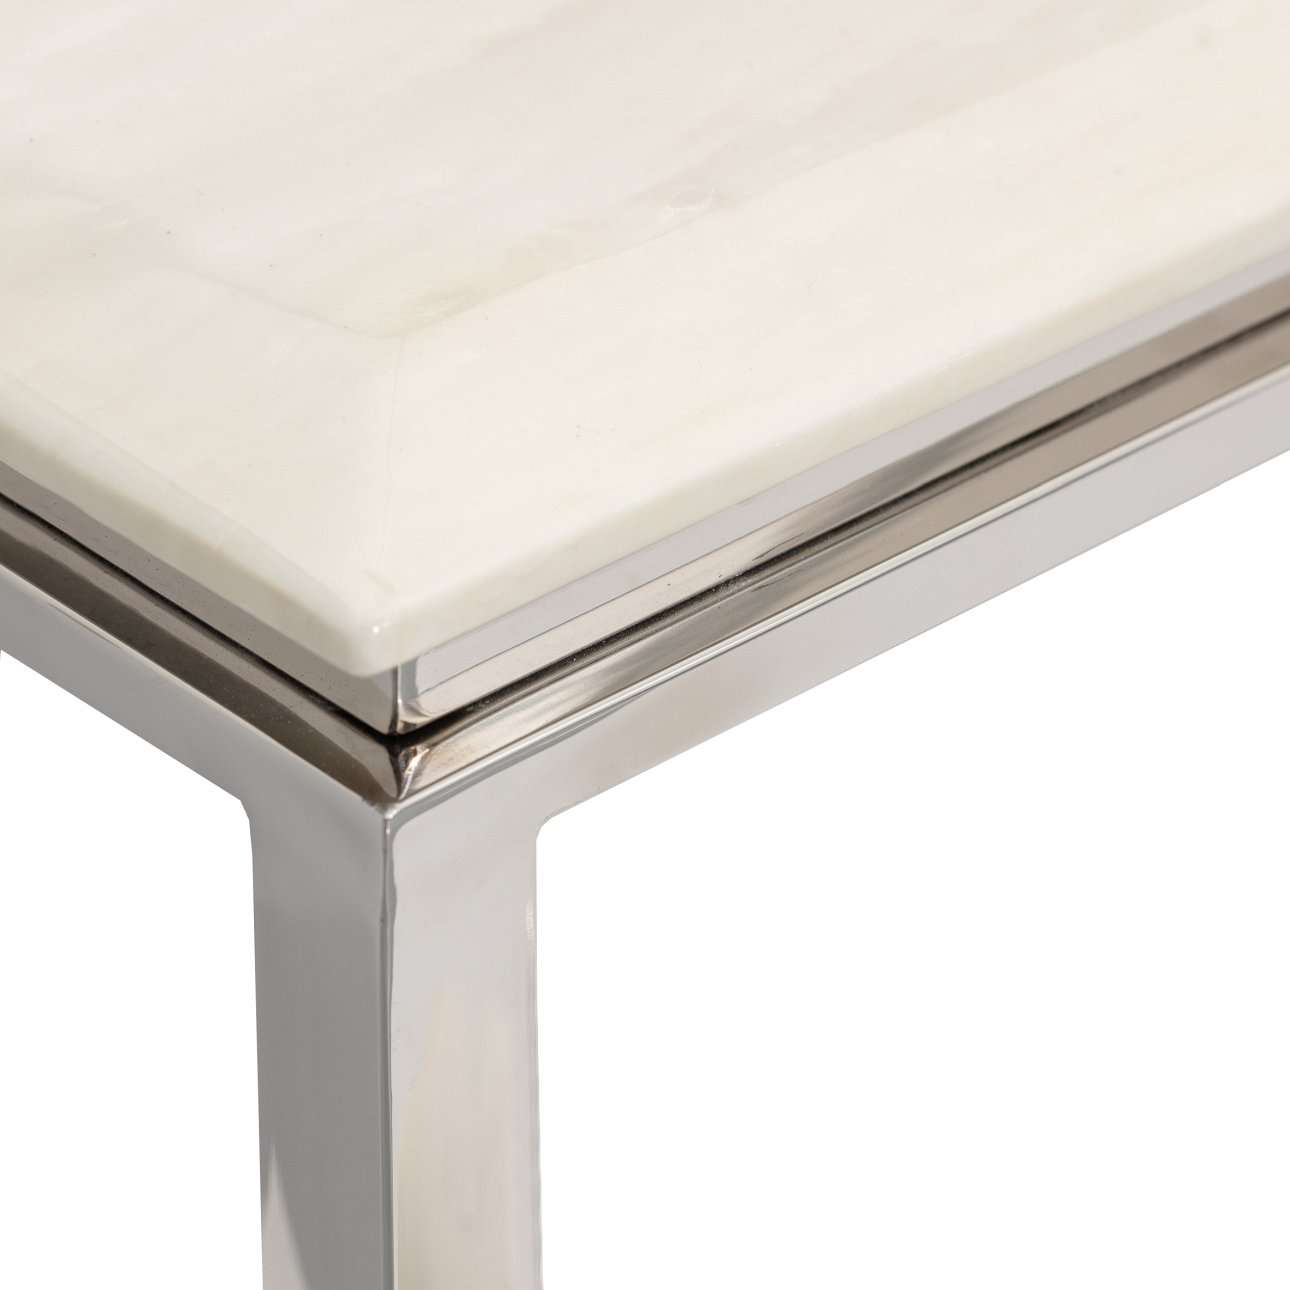 Ława Marble ivory white 70x130x42cm